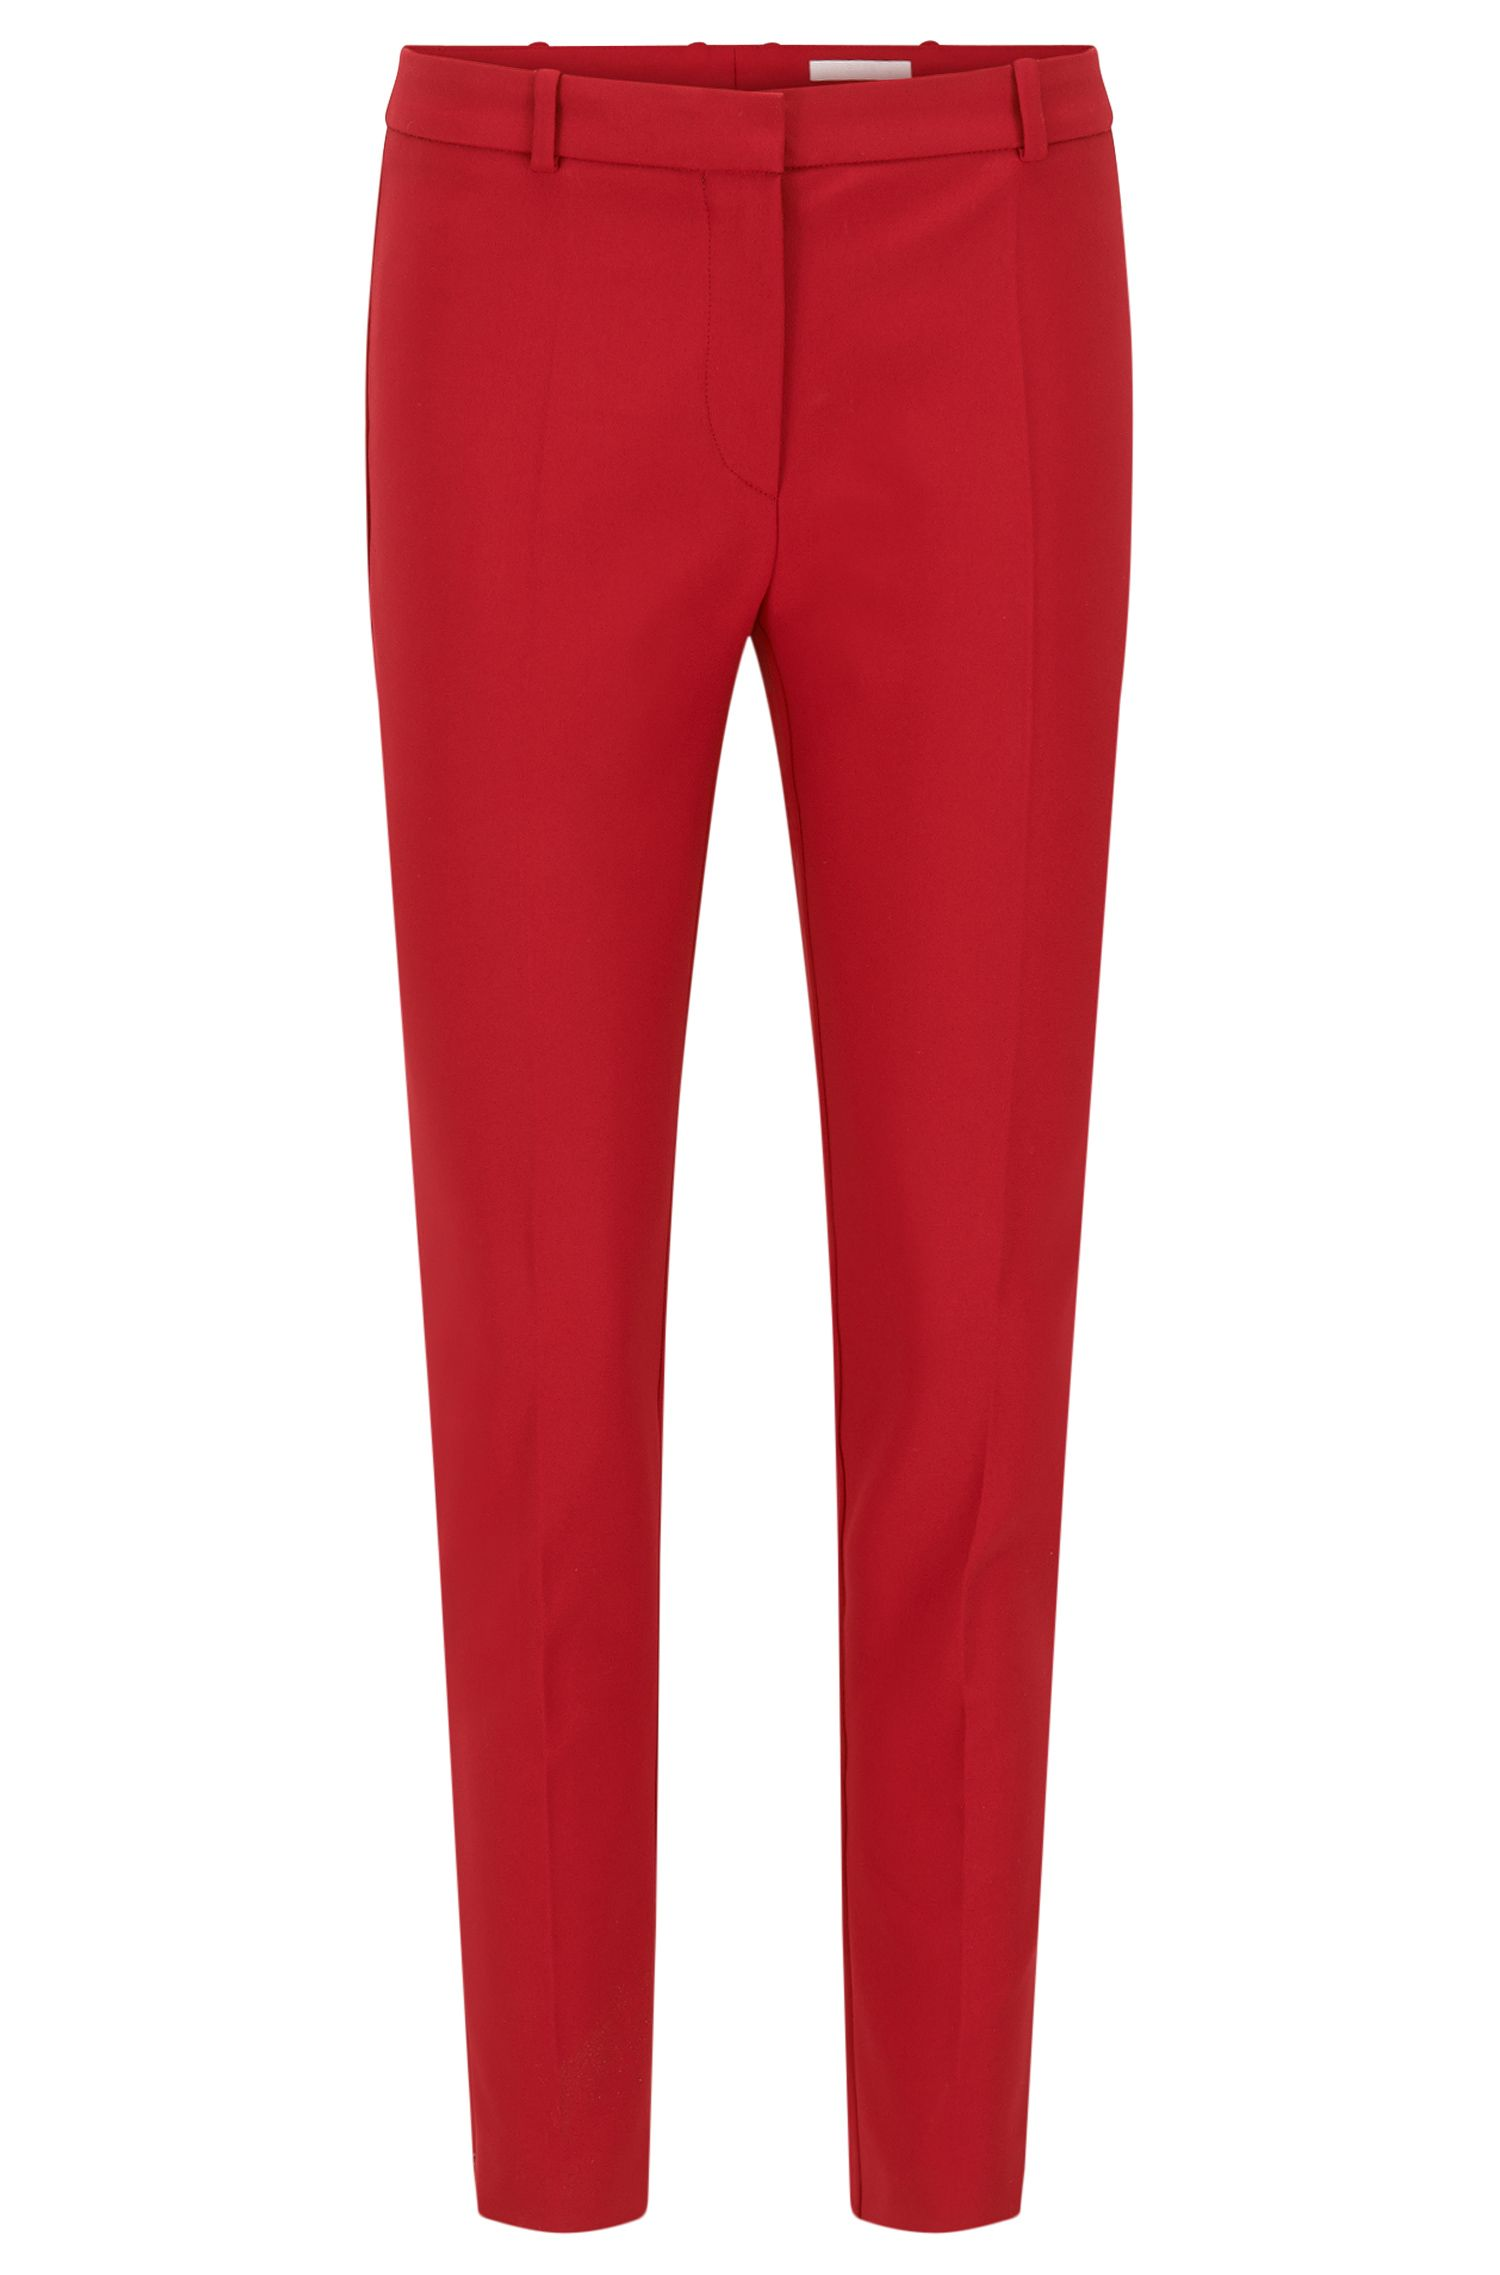 Pantalón regular fit en mezcla de algodón elástico